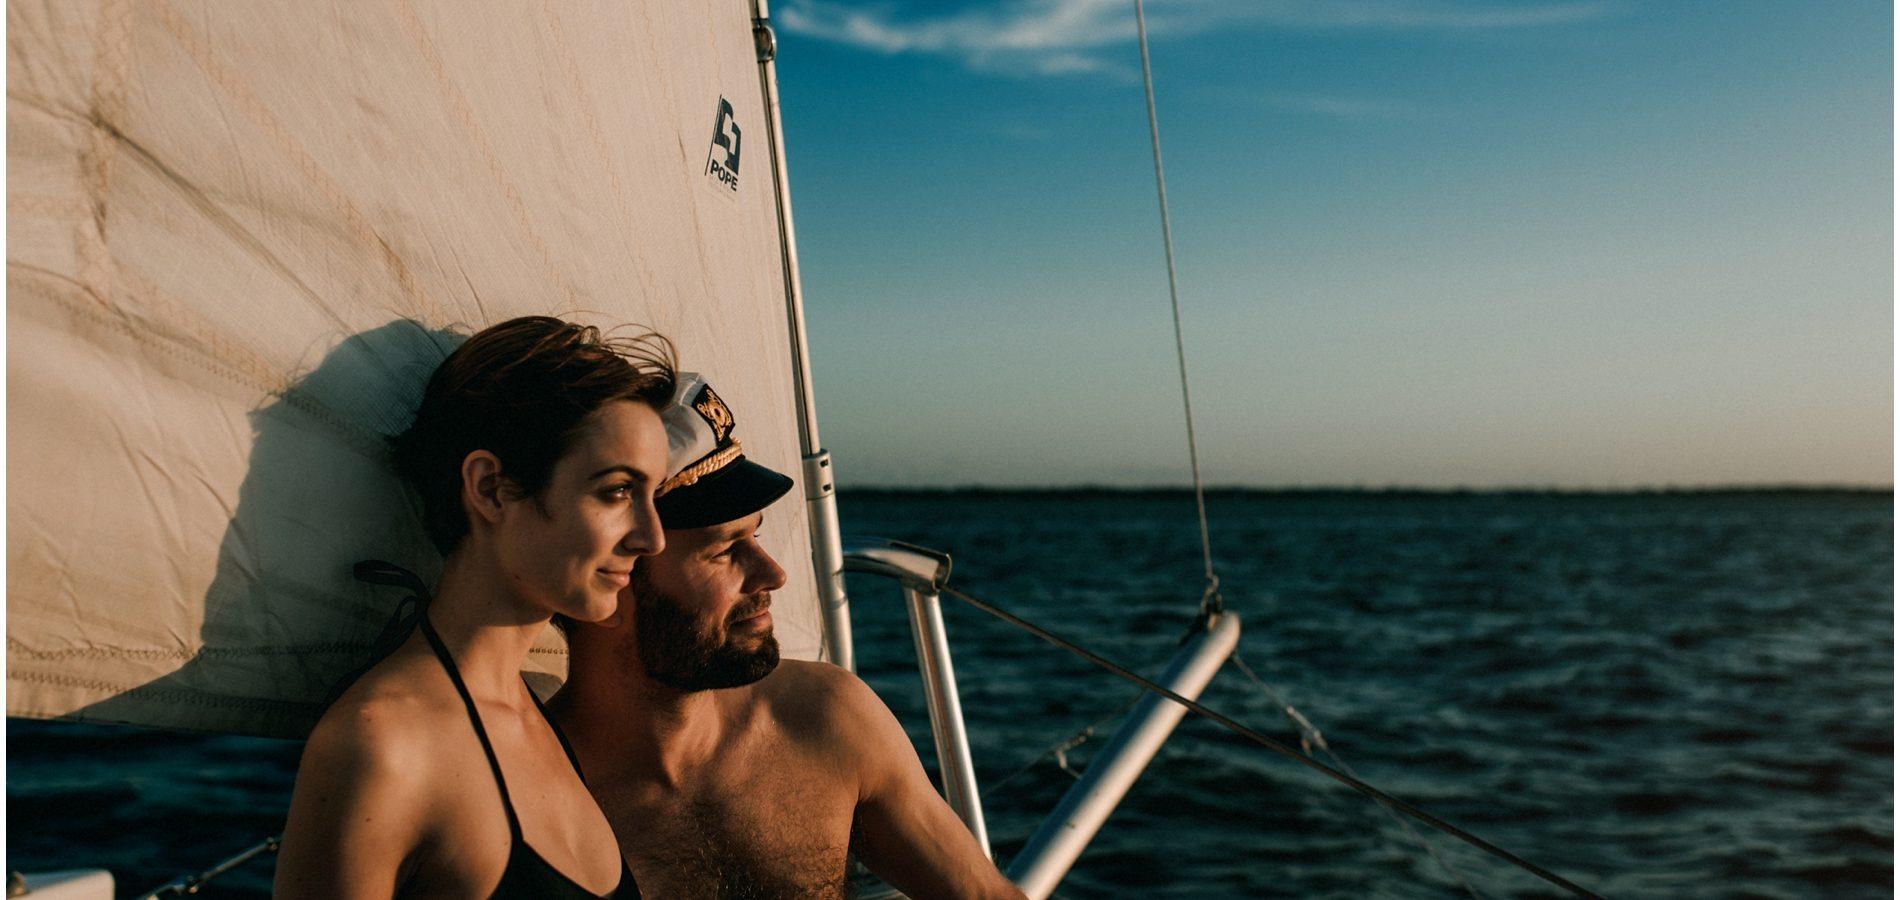 On a catamaran in Galveston Bay